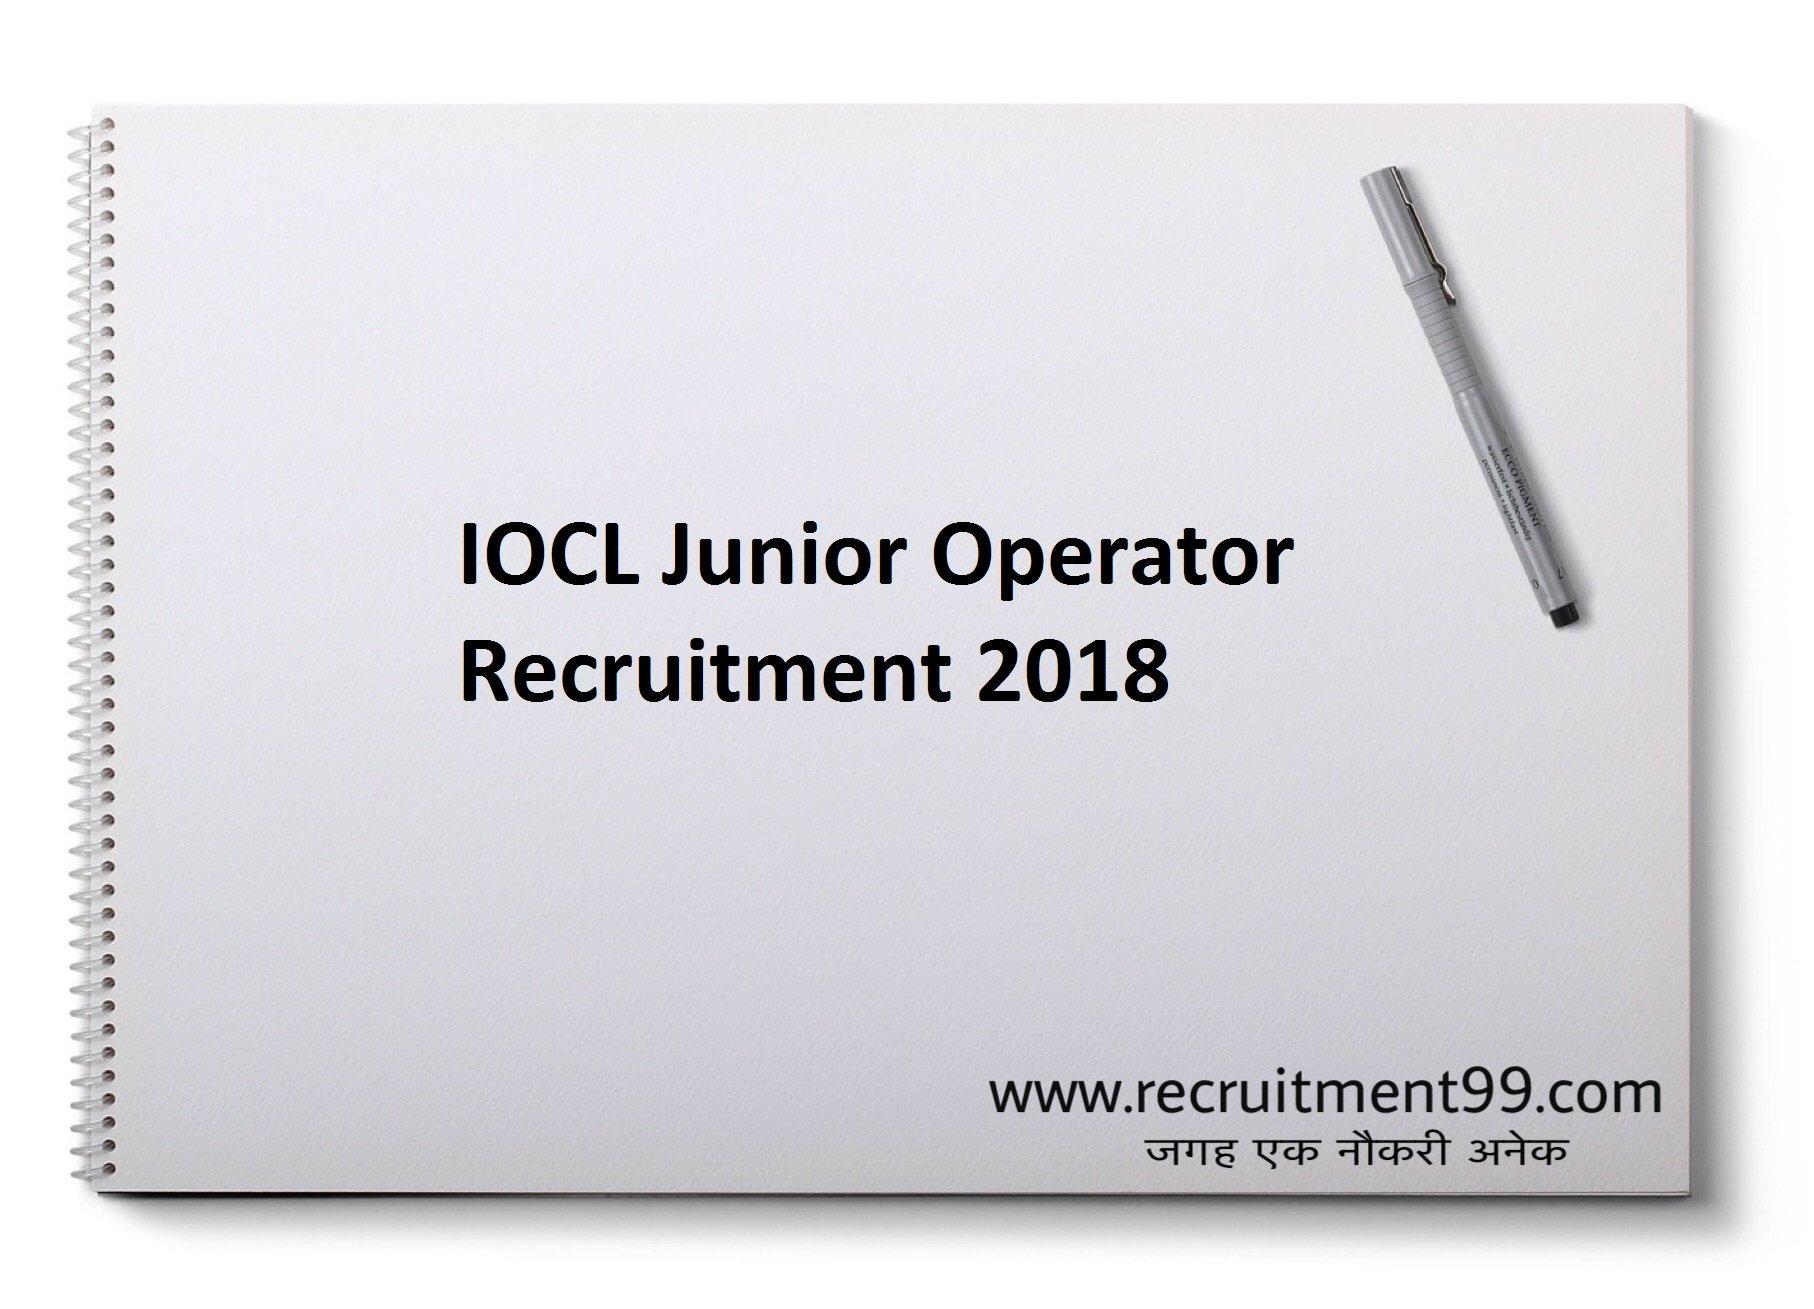 IOCL Junior Operator Recruitment Admit Card Result 2018